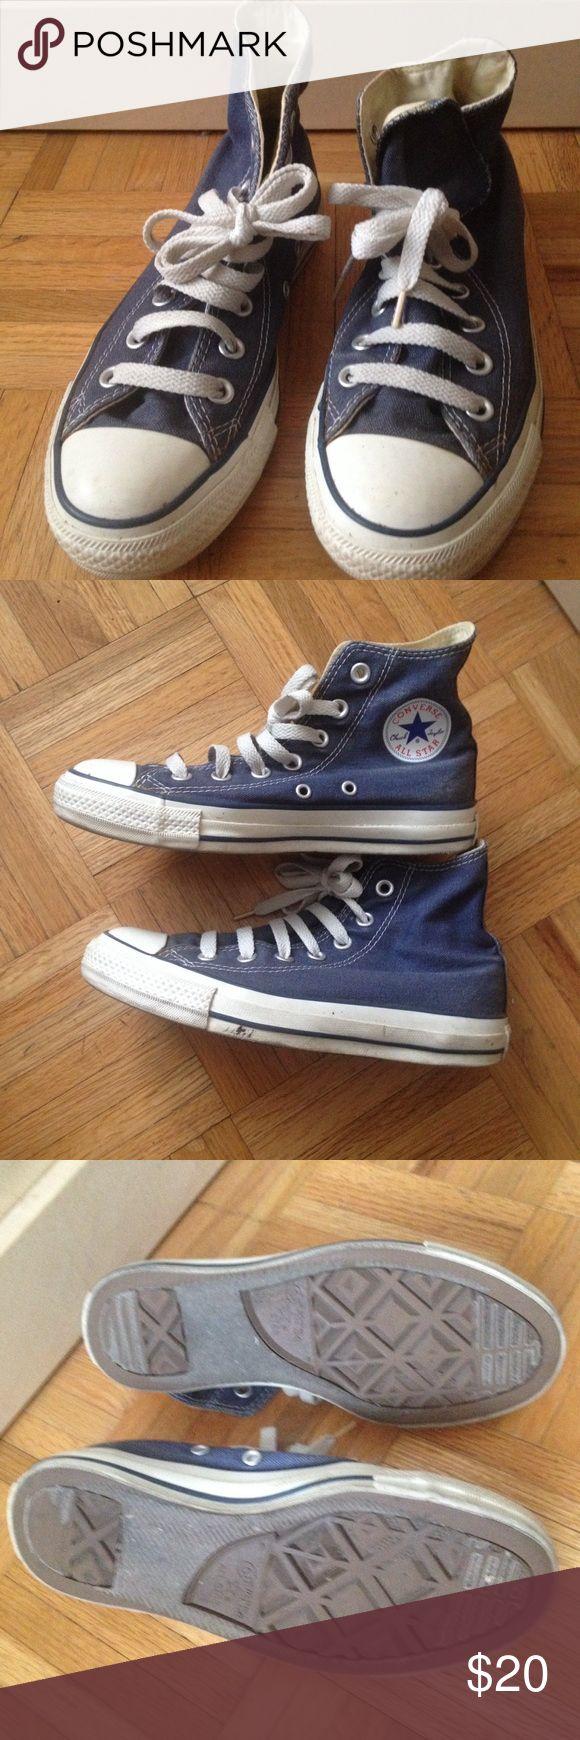 SOLD! Converse high tops sz 5.5 women blue on Poshmark! My username is: rockstarsissy. #shopmycloset #poshmark #fashion #shopping #style #forsale #Converse #Shoes